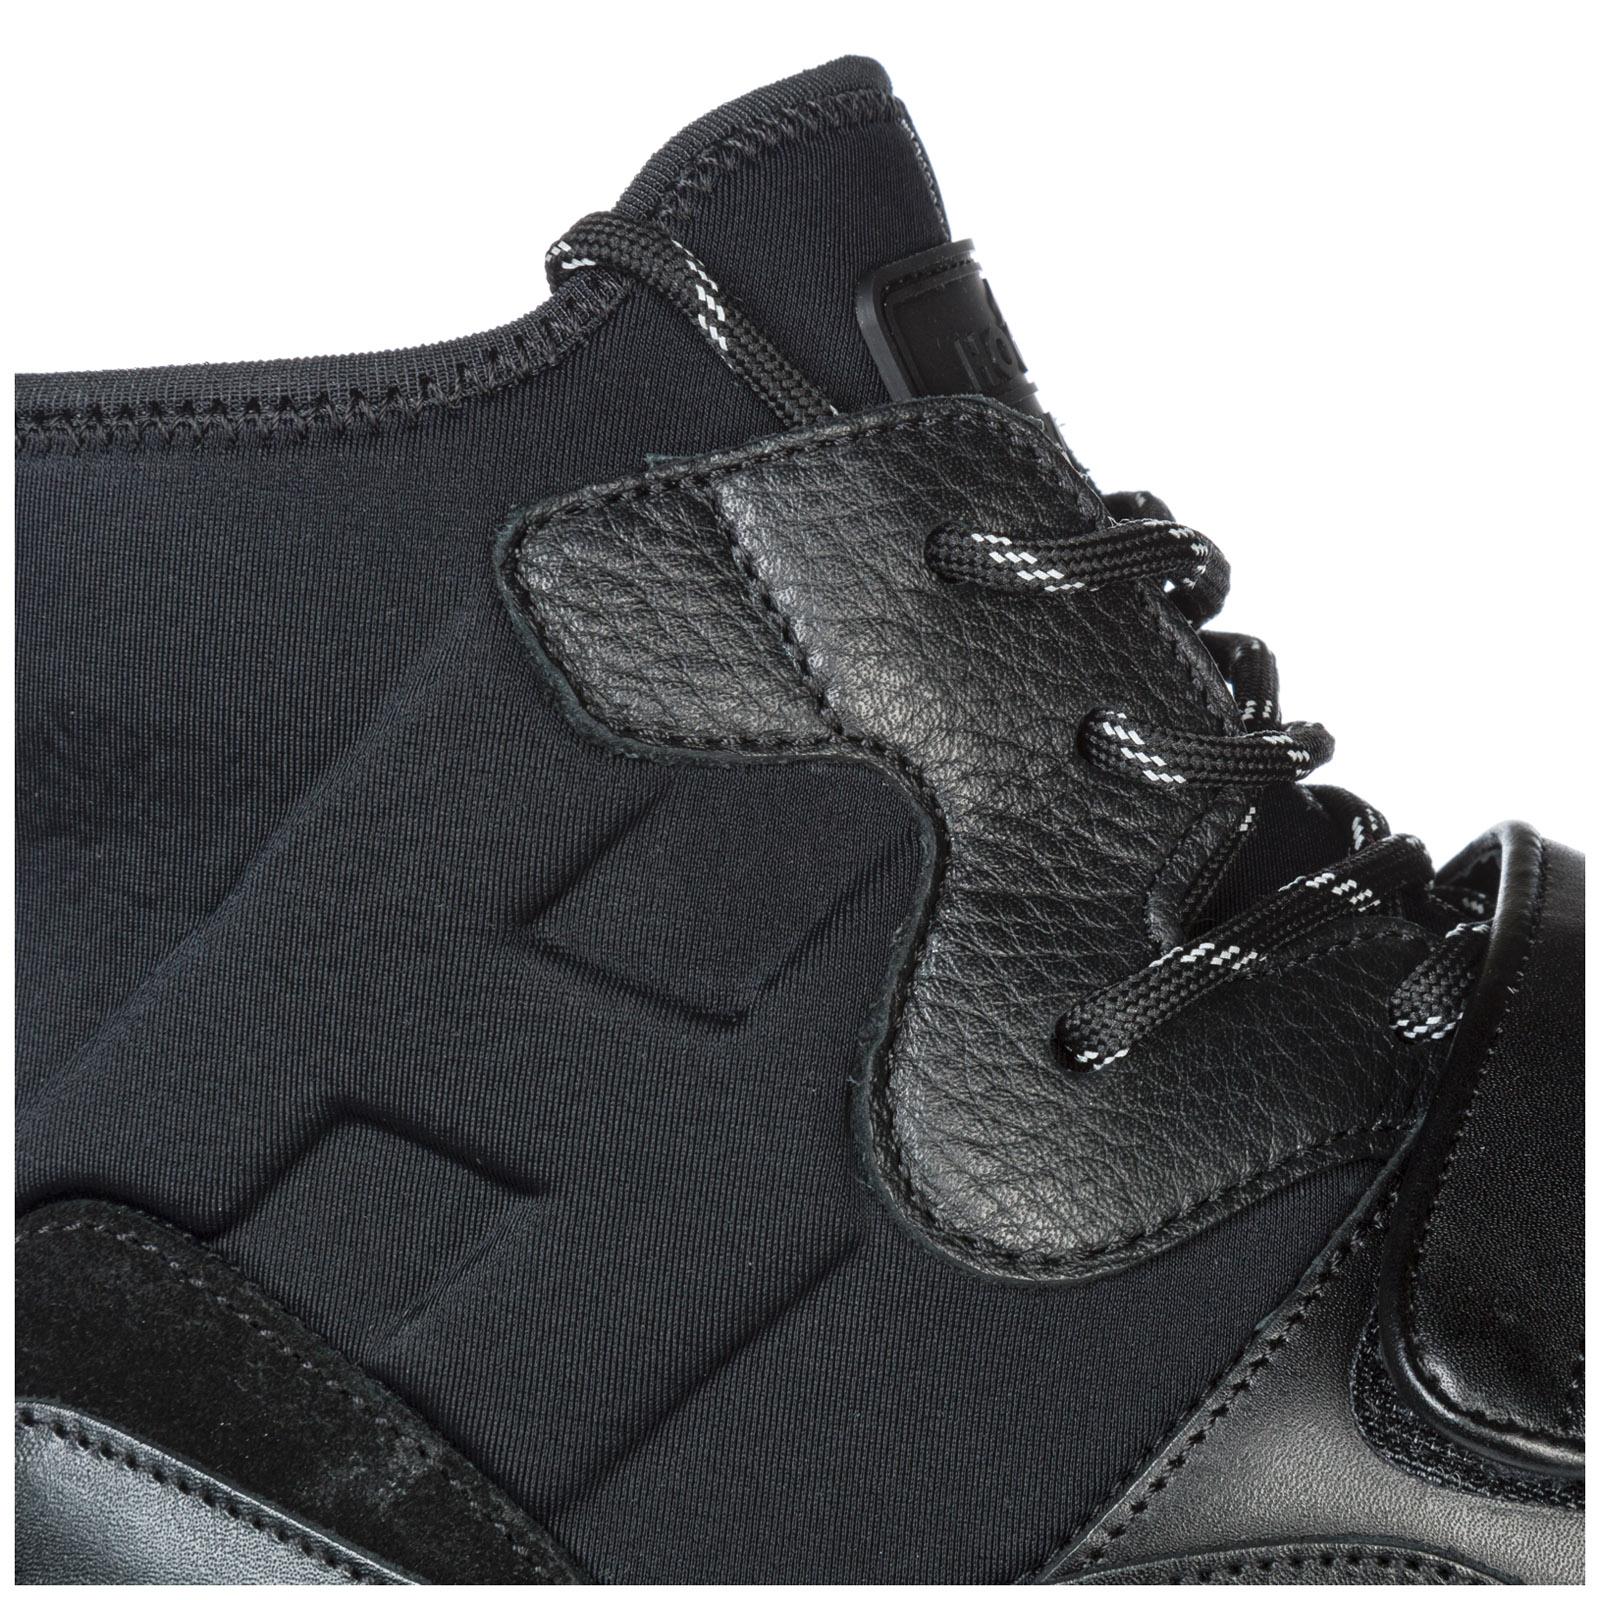 a1d4a9f0d357a High top sneakers Hogan Interactive³ GYM3710AY70K0R0XCR nero ...